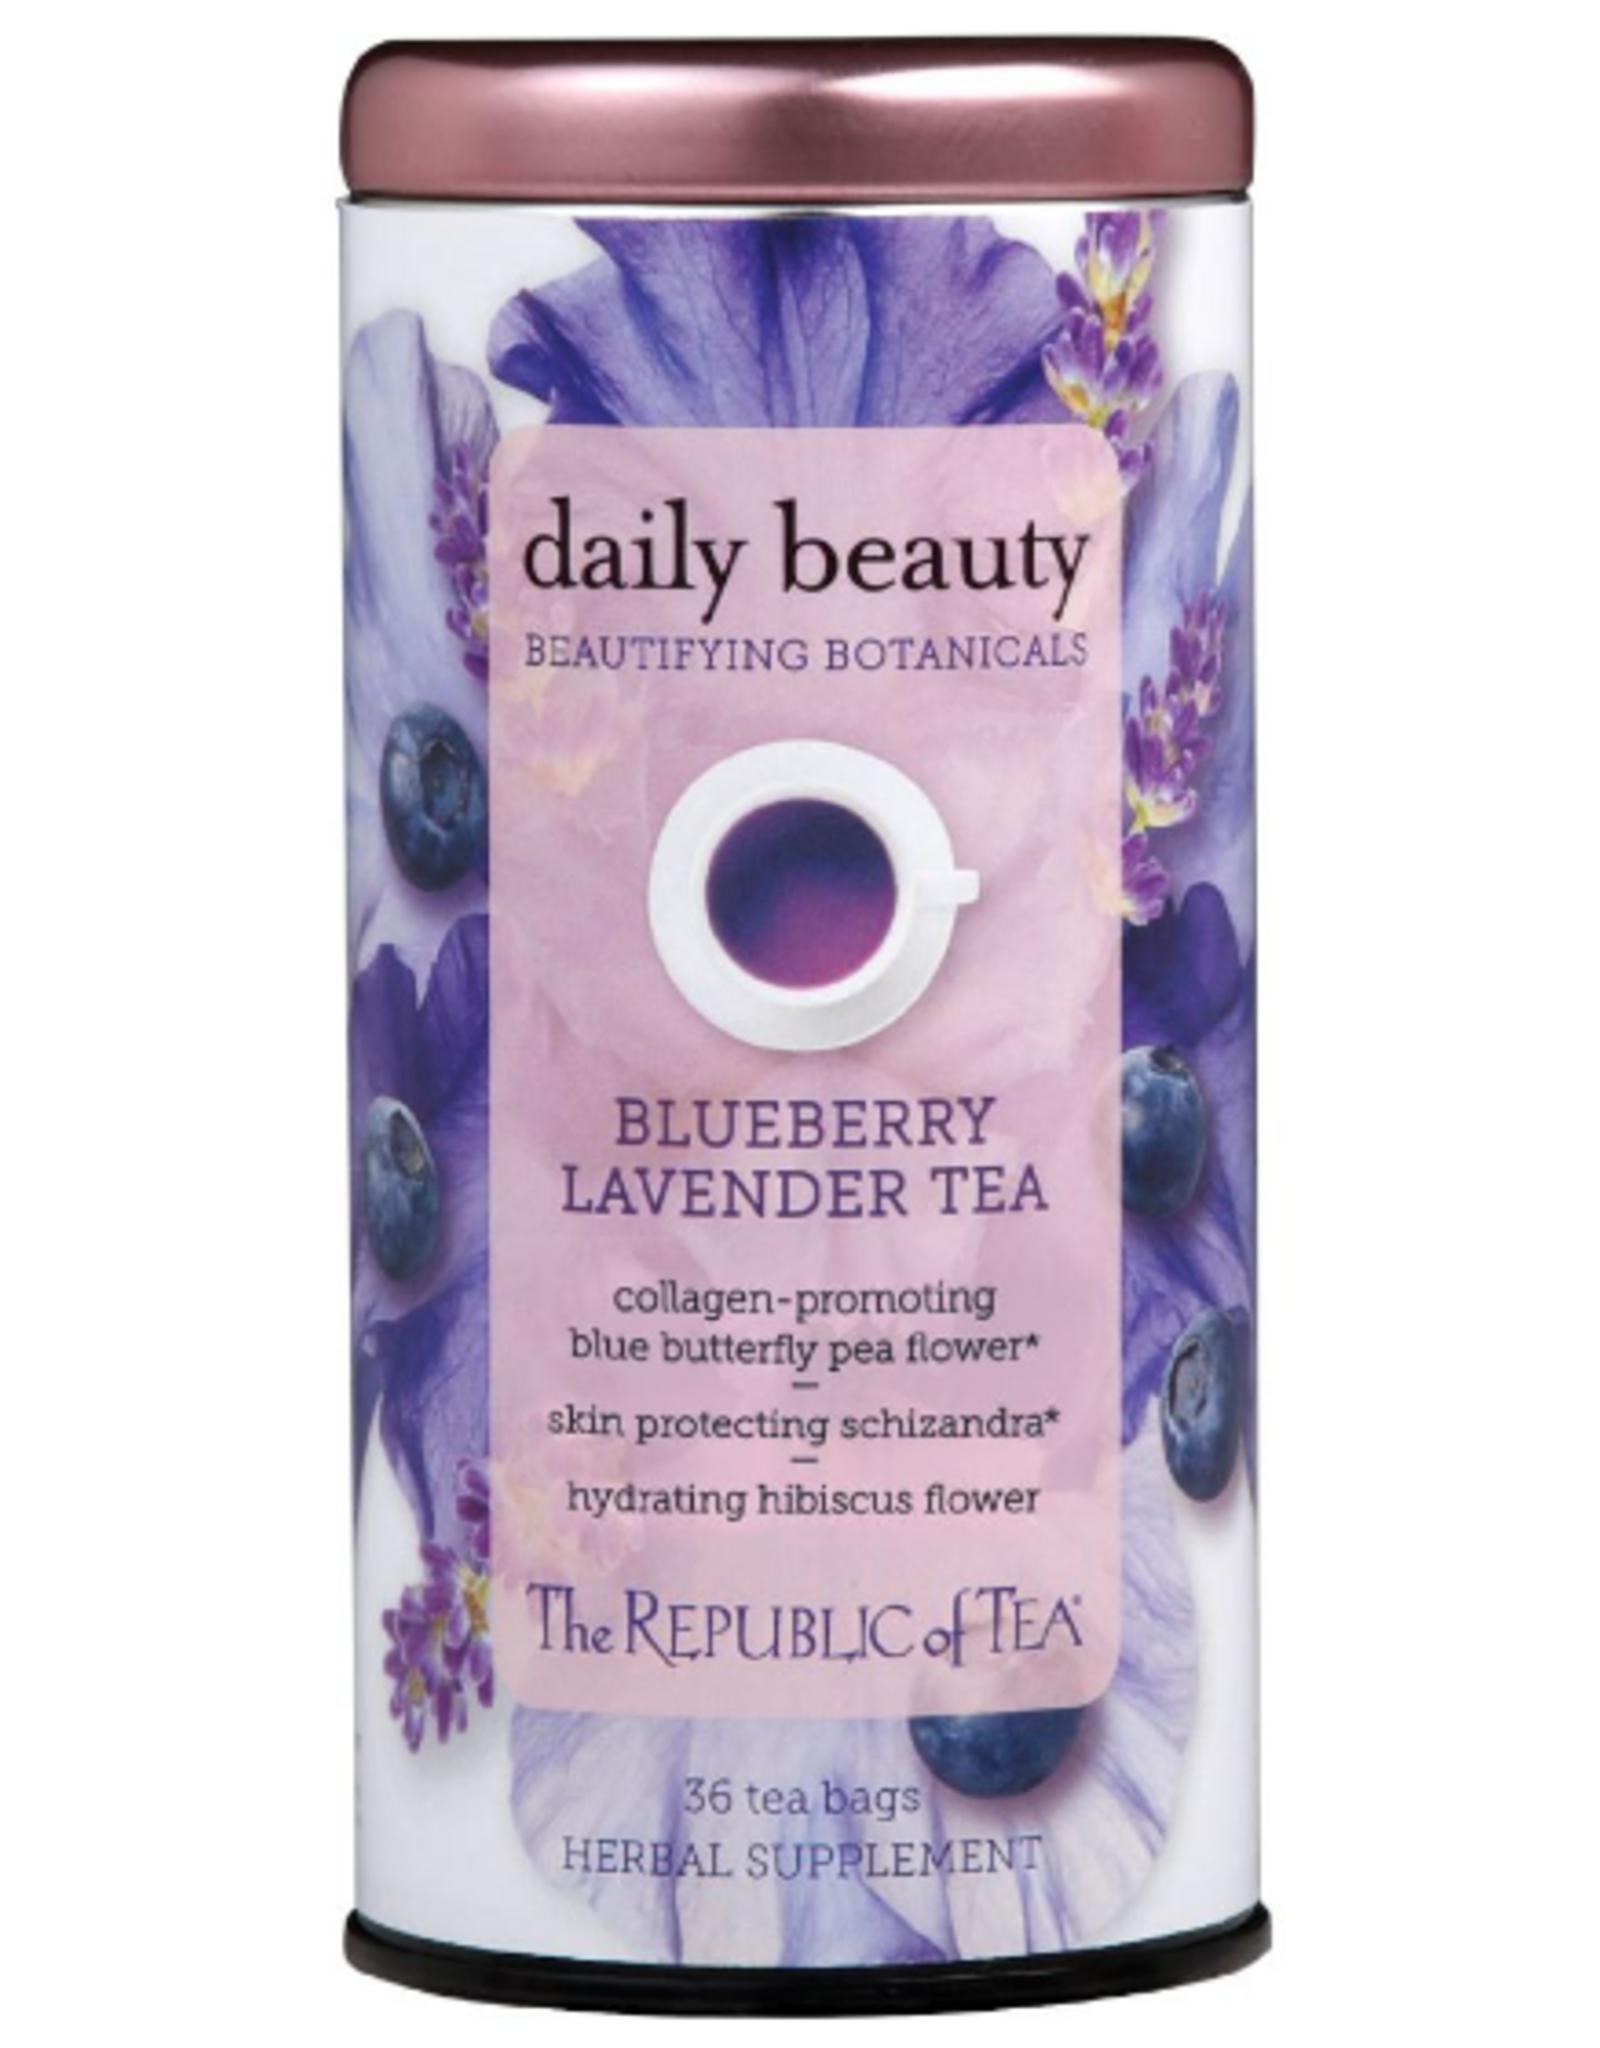 The Republic of Tea Daily Beauty Tea 36 Bag Tin